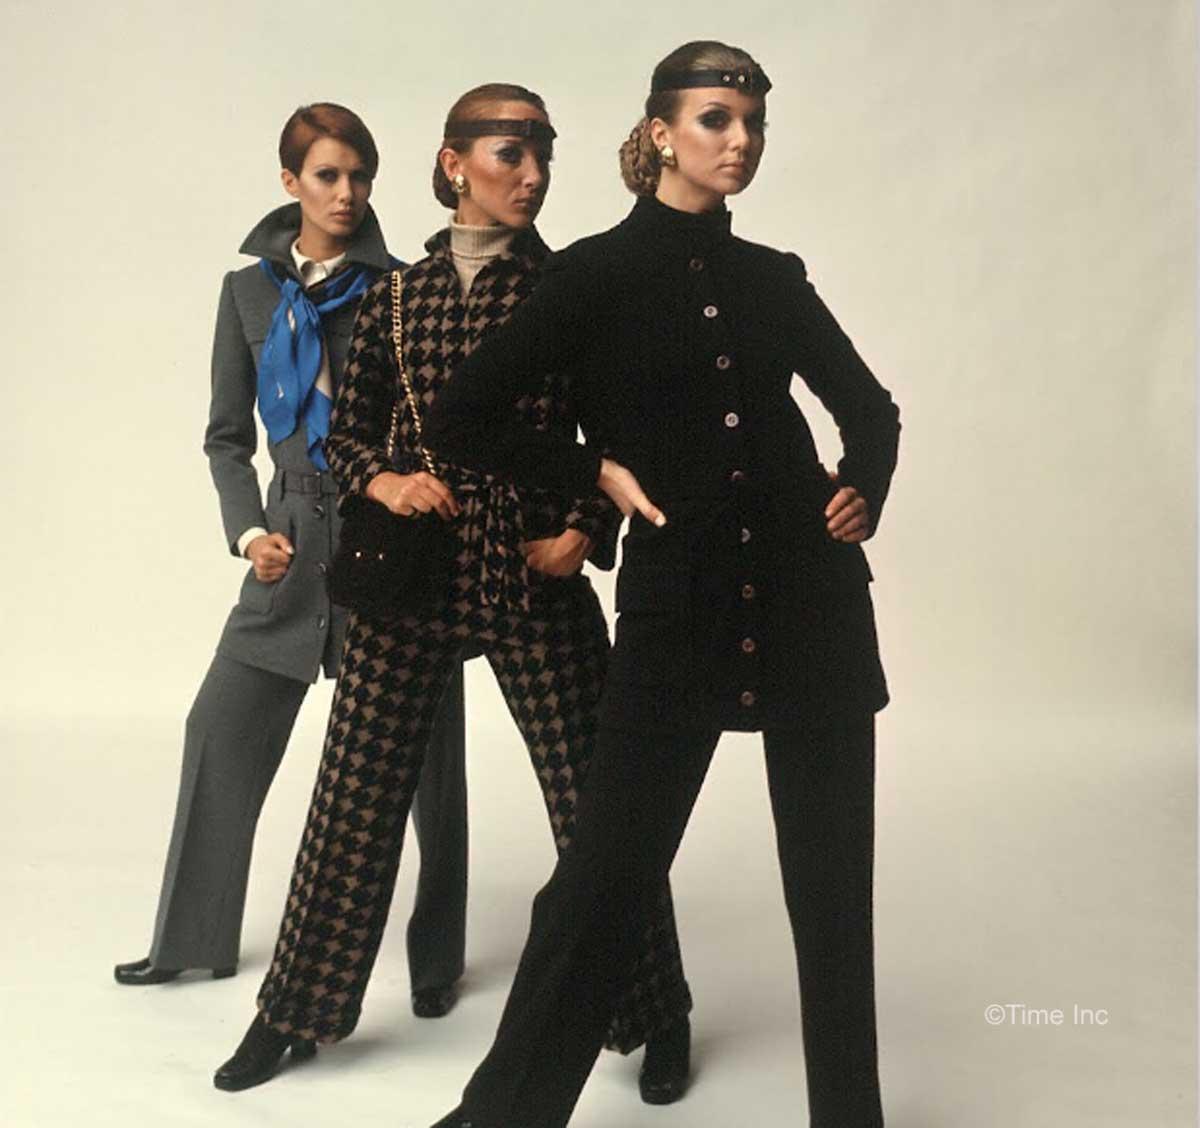 1960s-Fashion---Paris-Fall-Season-of-1968---St-Laurent